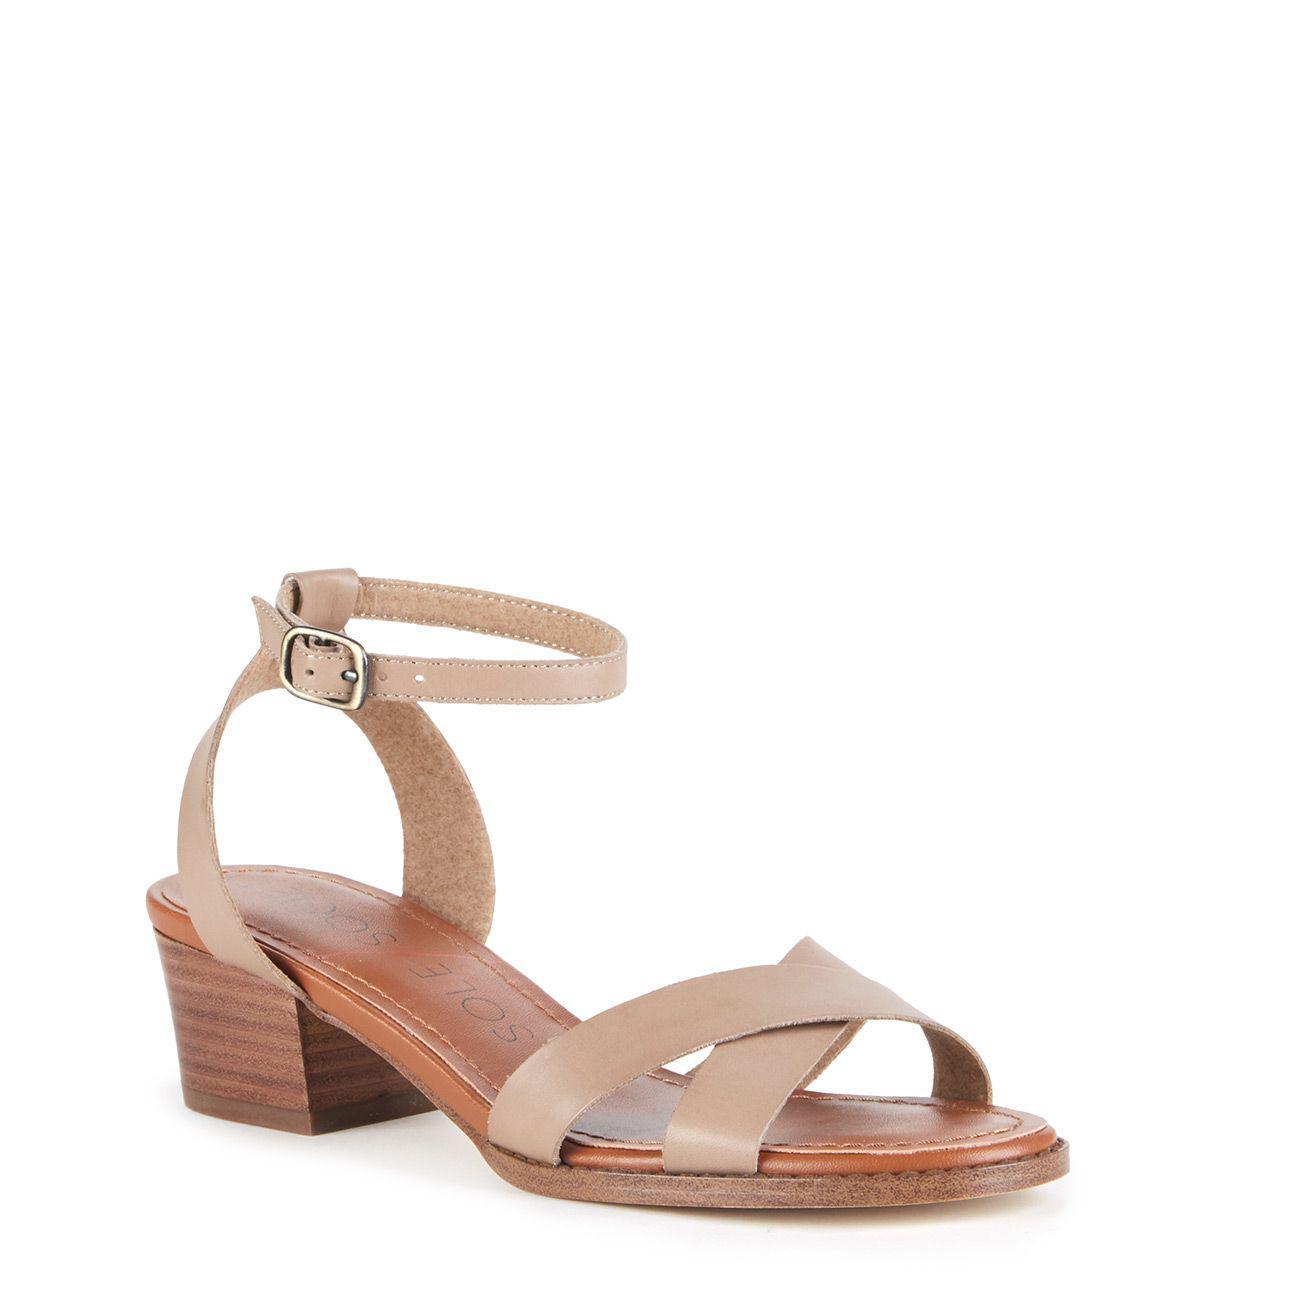 dbca27c7568 Lyst - Sole Society Savannah Block Heel Sandal